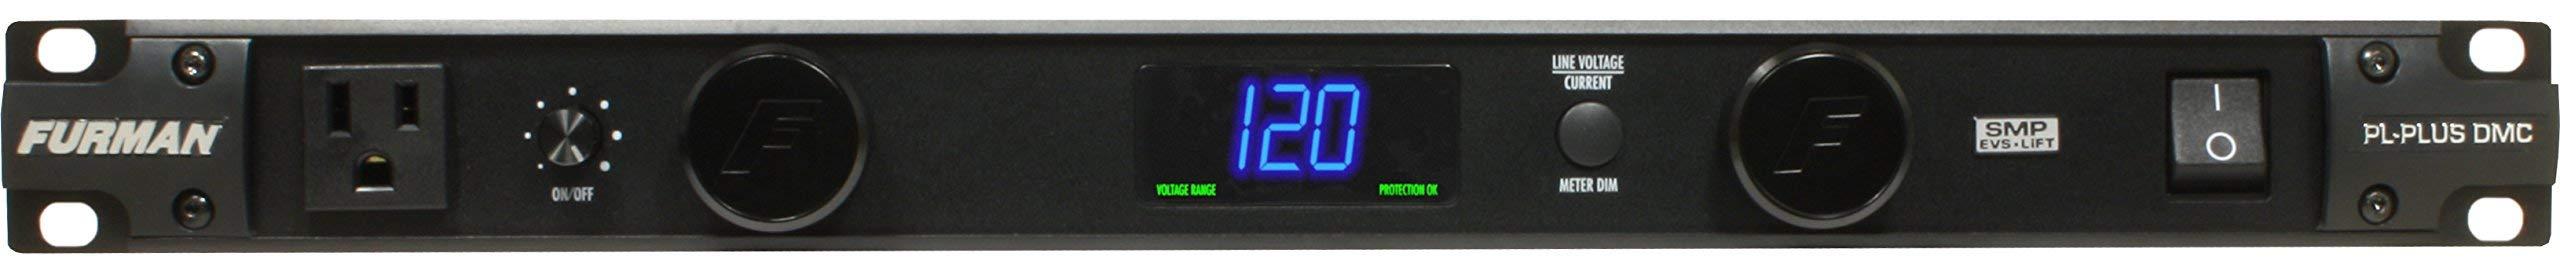 Furman PL-PLUS DMC Power Conditioner with Voltmeter / AMMeter (Renewed)